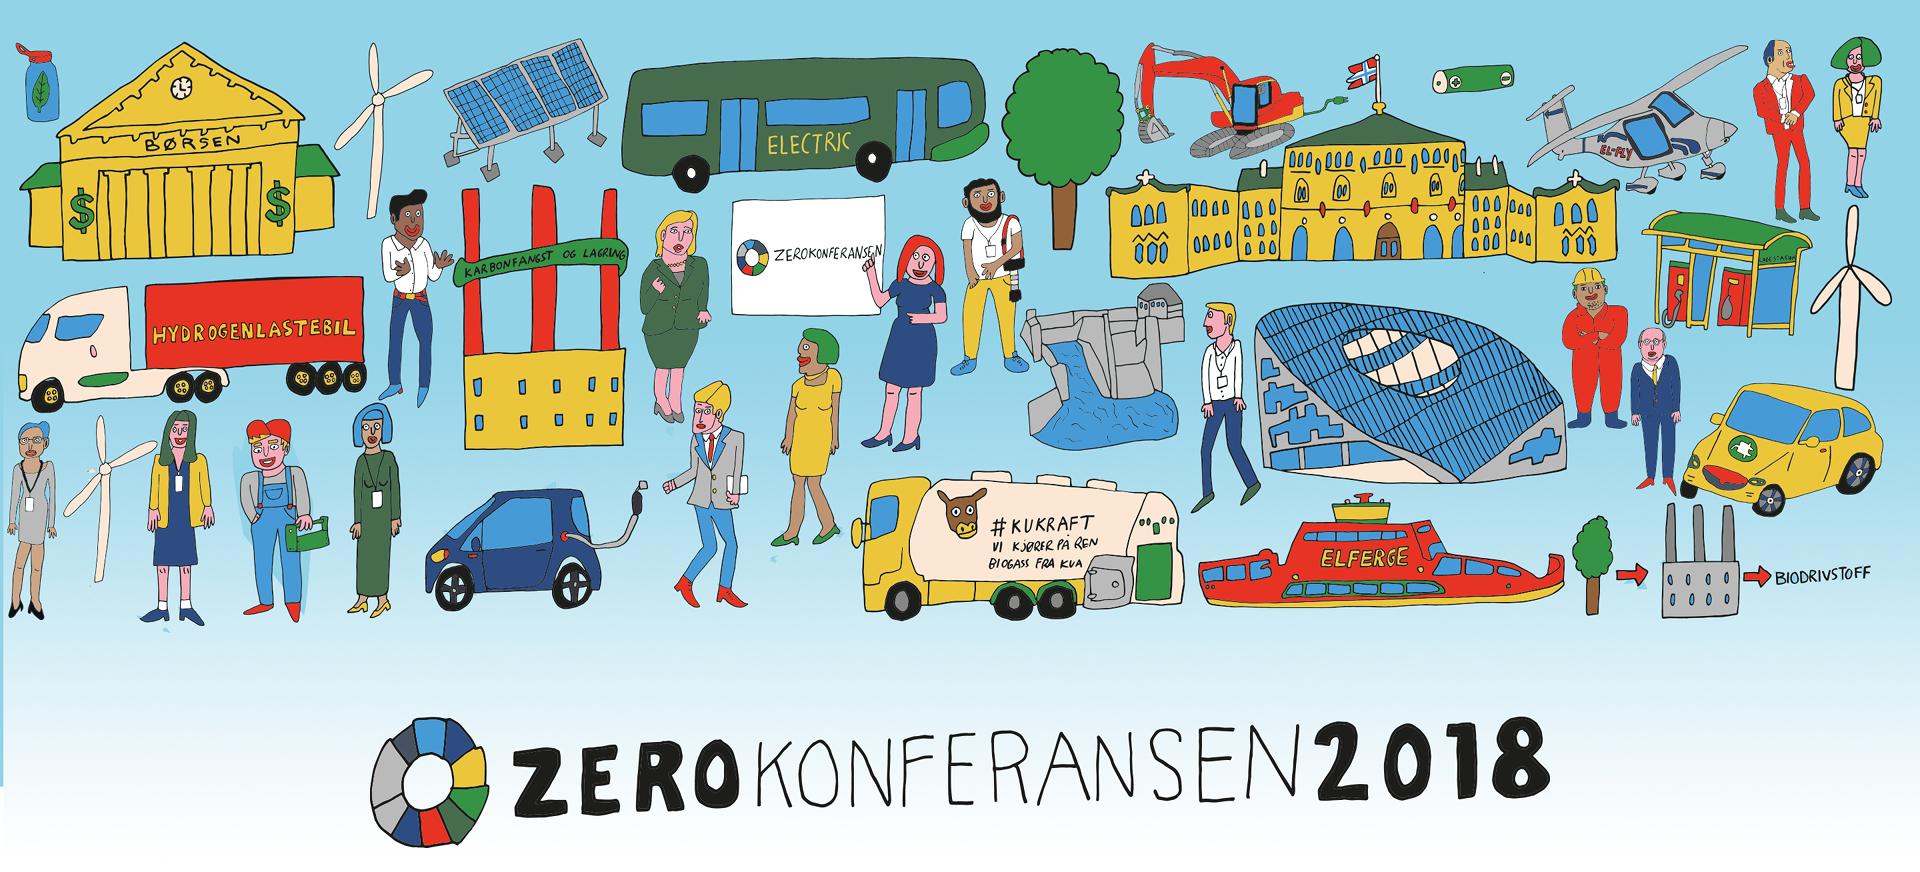 Bilderesultat for zerokonferansen 2018